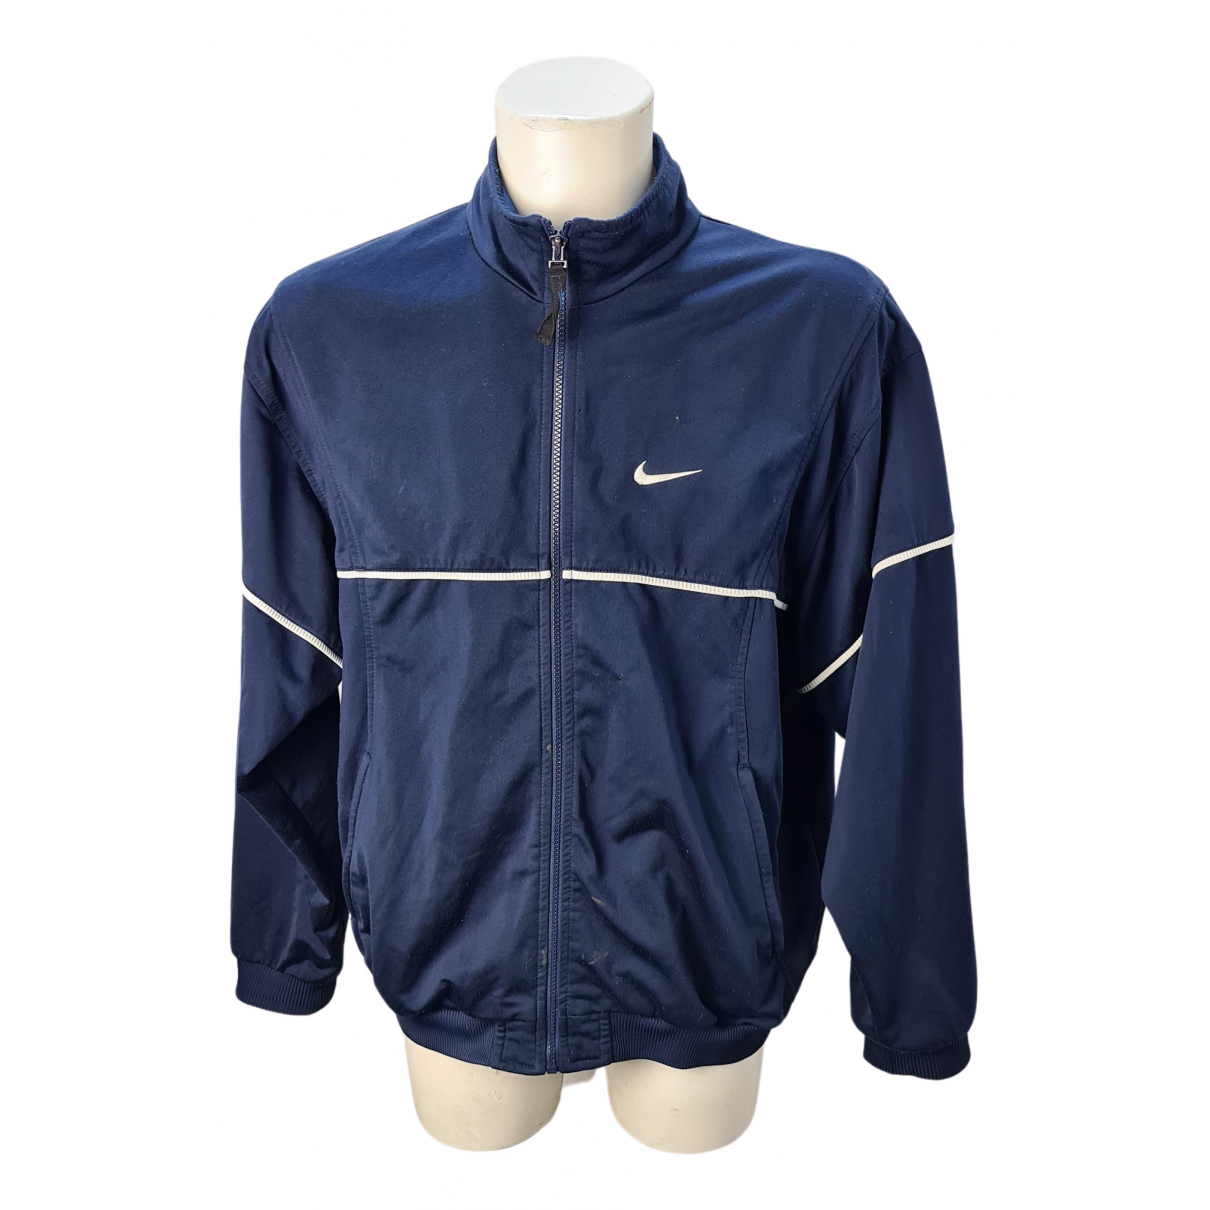 Nike \N Jacke in  Blau Synthetik